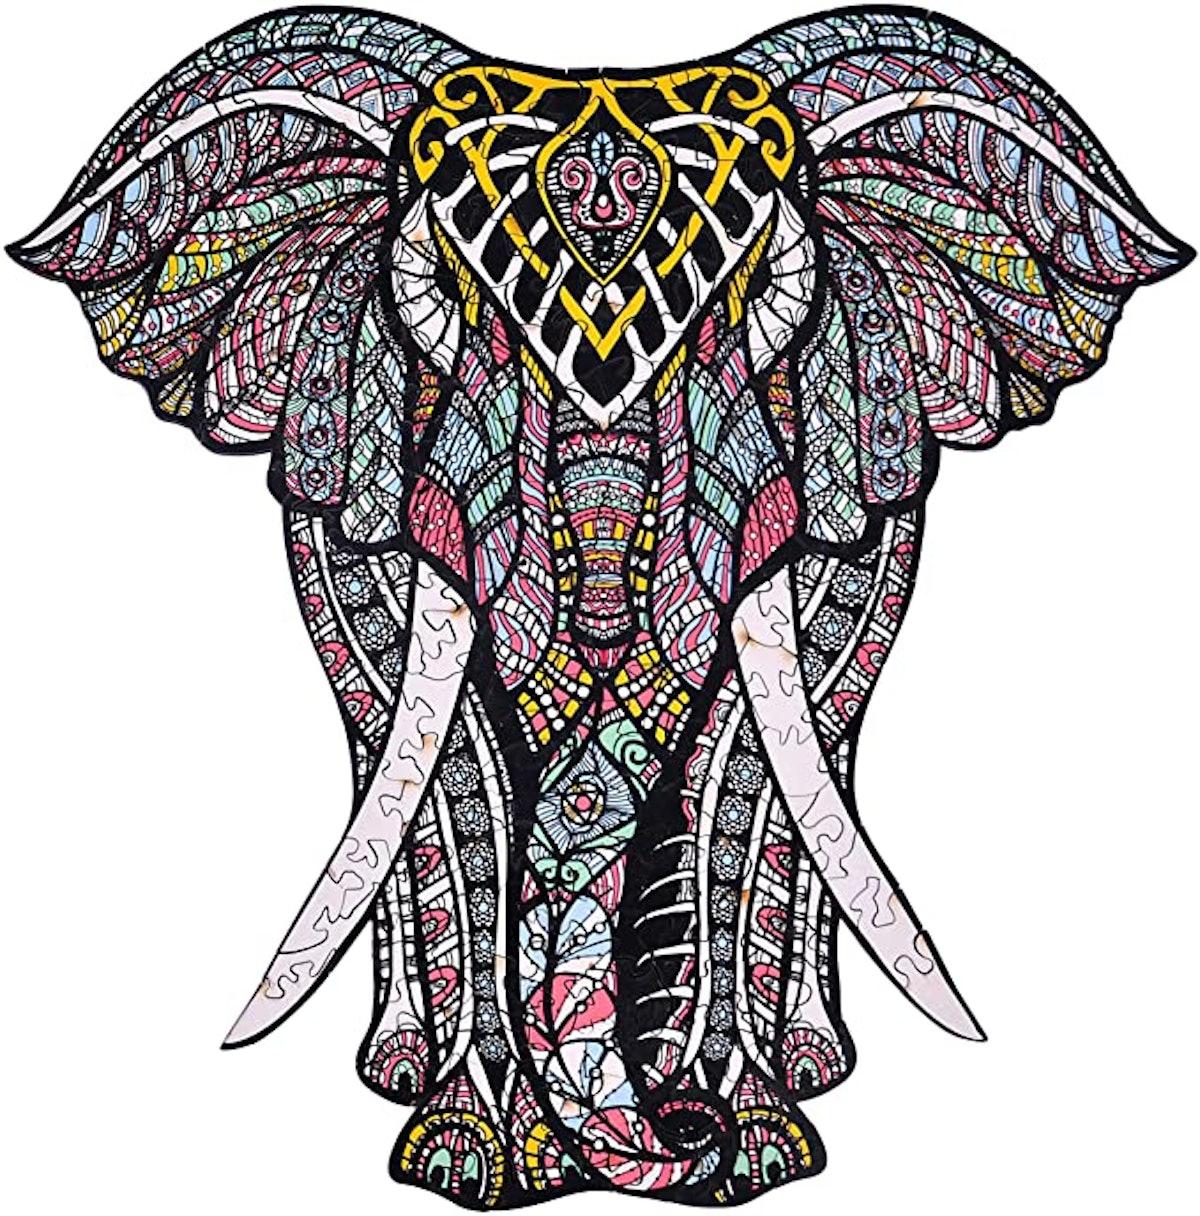 Hartmaze Decorative Elephant Decorative Elephant Wooden Jigsaw Puzzle